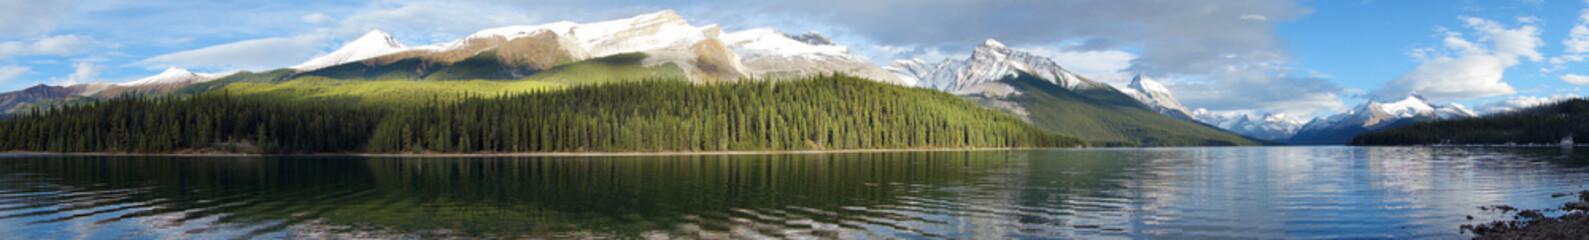 Maligne lake, Jasper national park, Canada, panoramic view